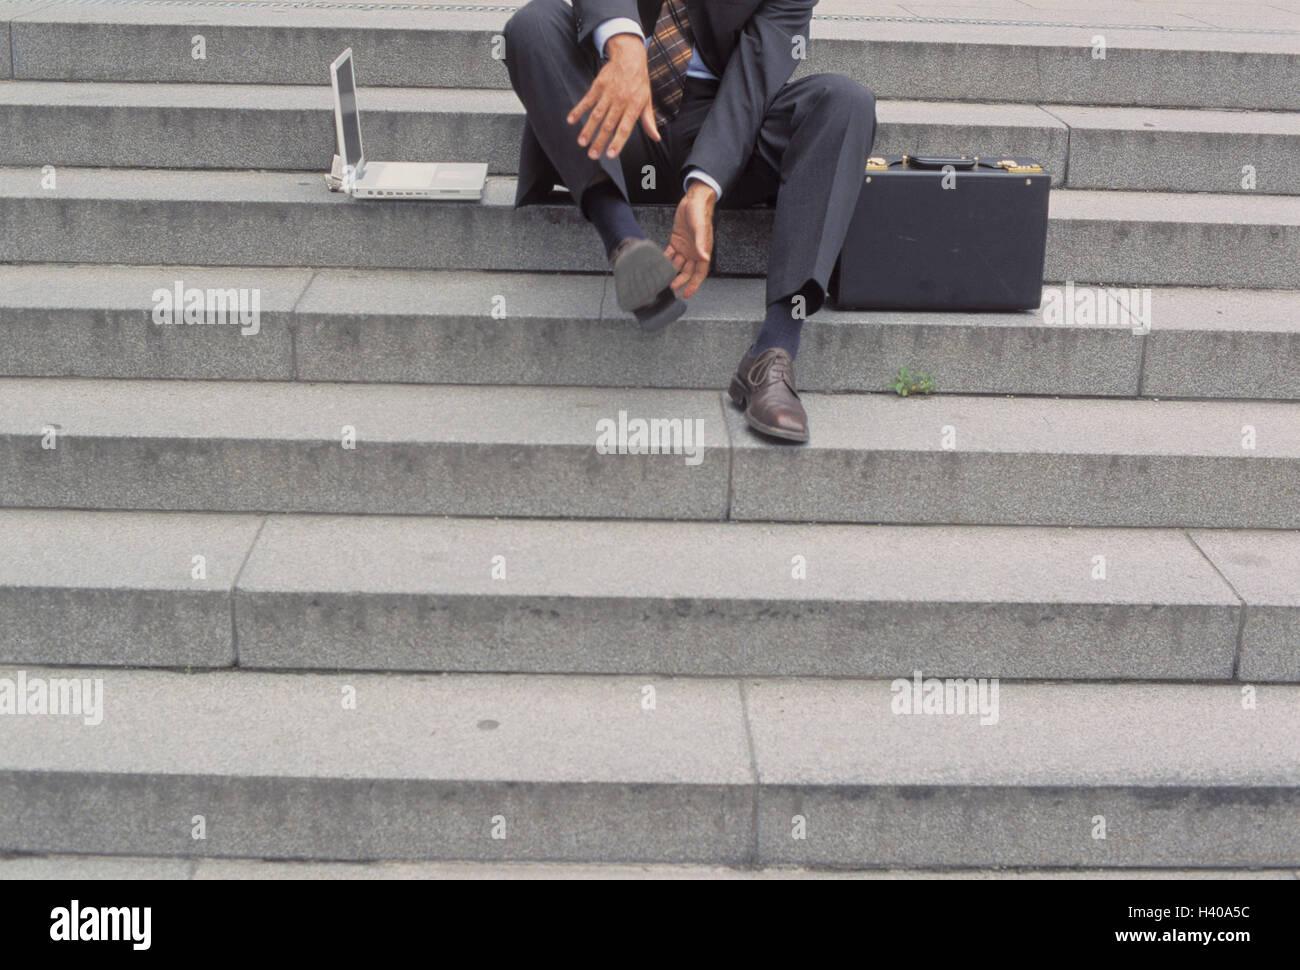 Treppen, Geschäftsmann, Detail, Schuh, Streifen, Beruf, Geschäft, Mann,